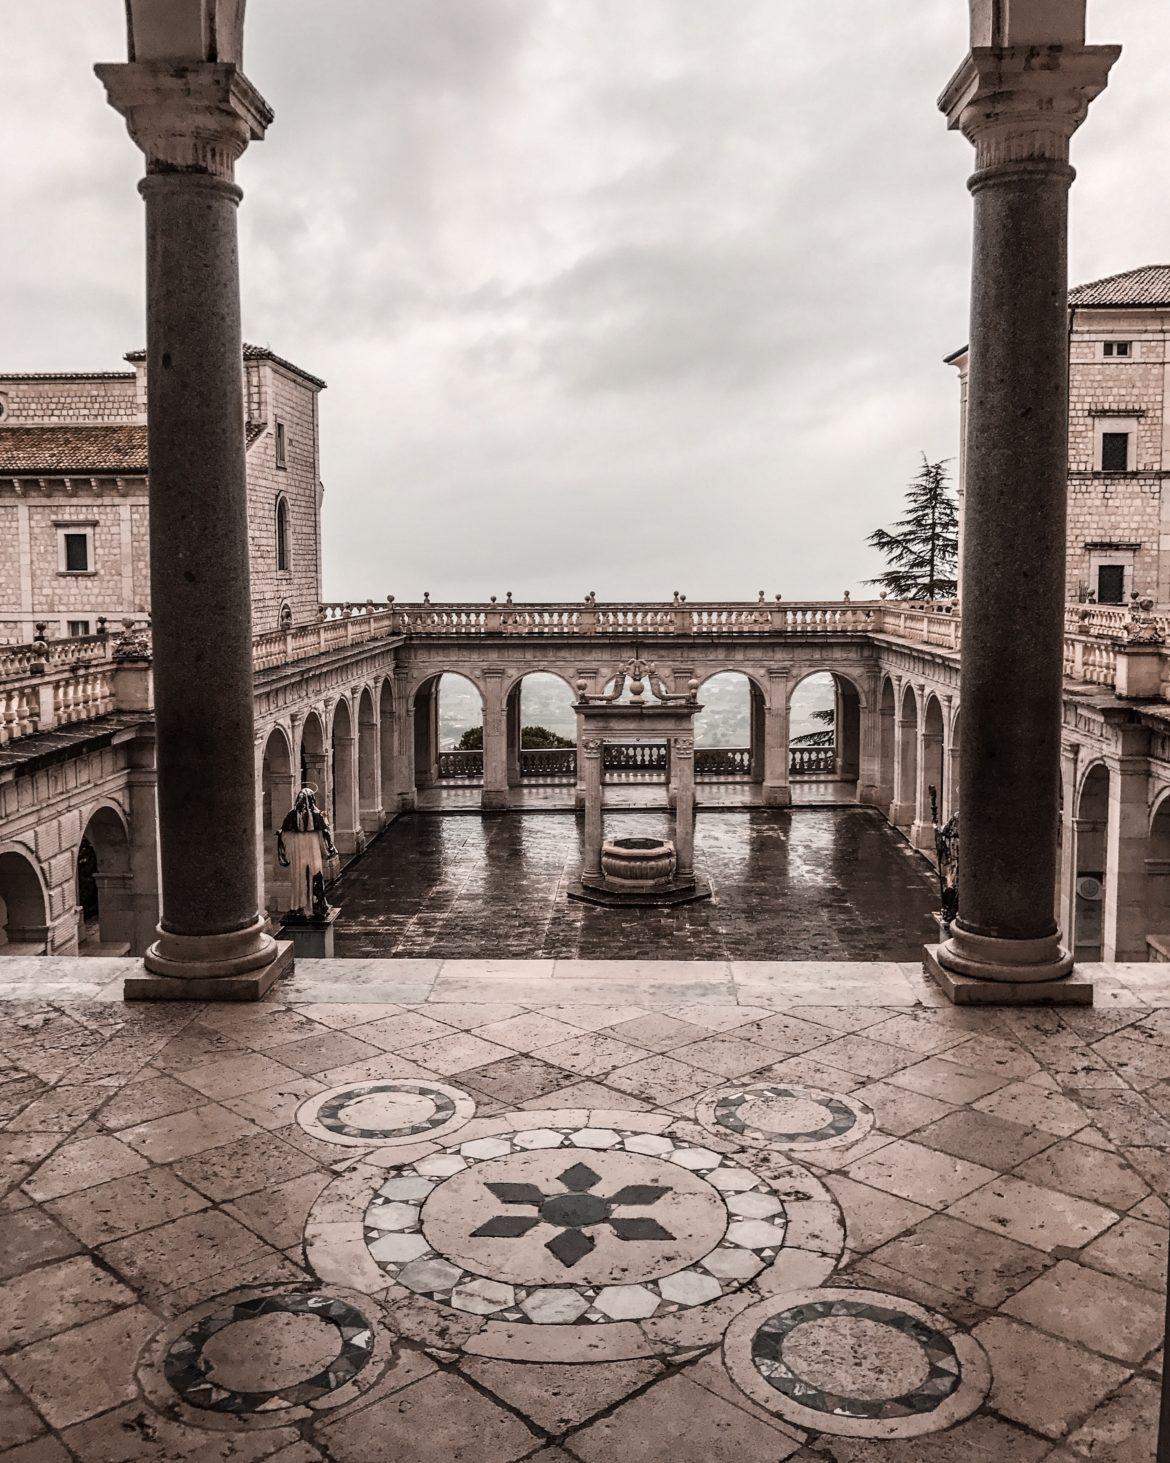 Montecassino epicenter of the Second World War